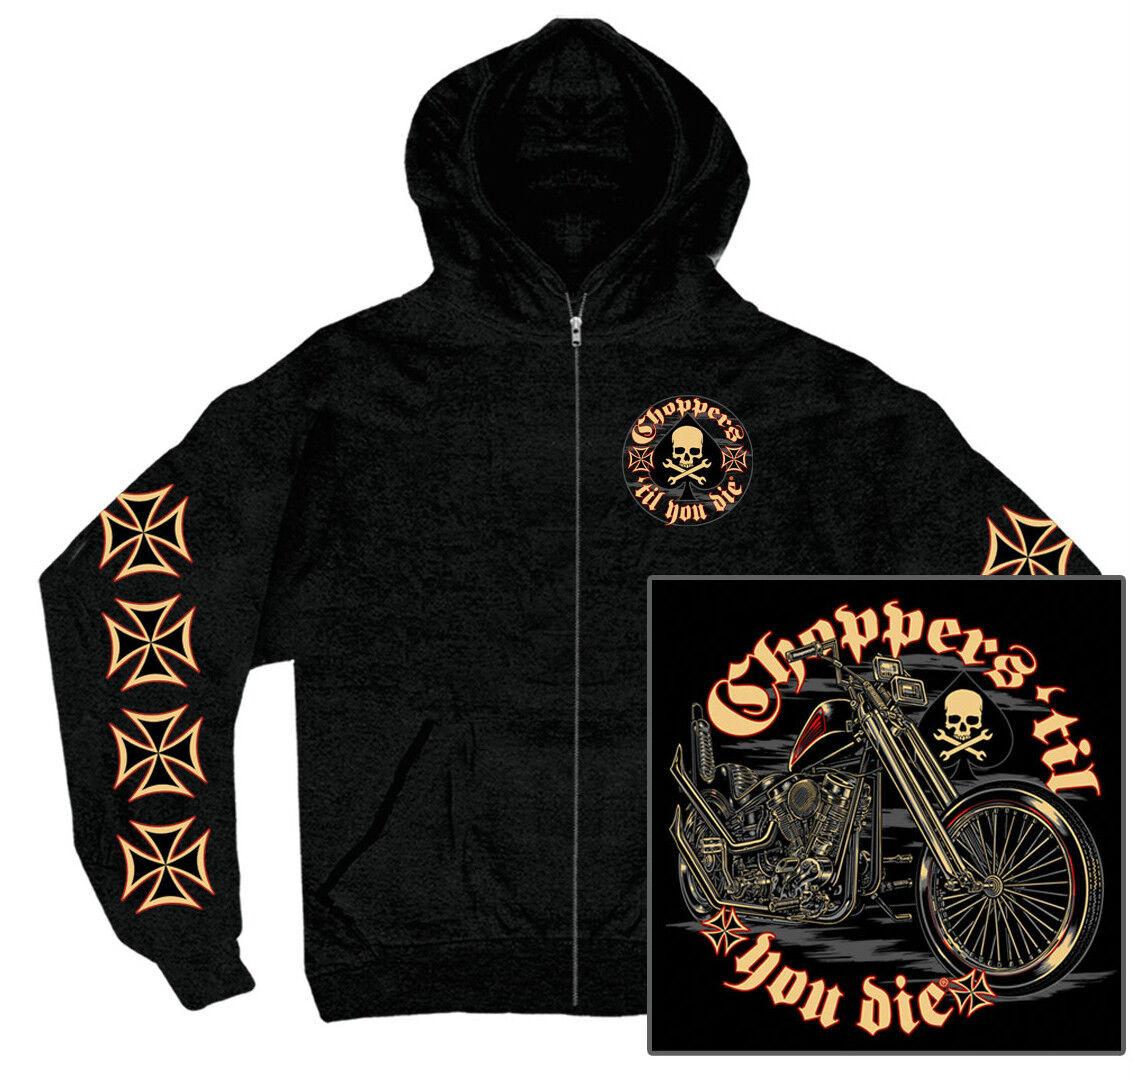 Croce Maltese biker hoodie Chopper till you i biker backprint USA Rocker